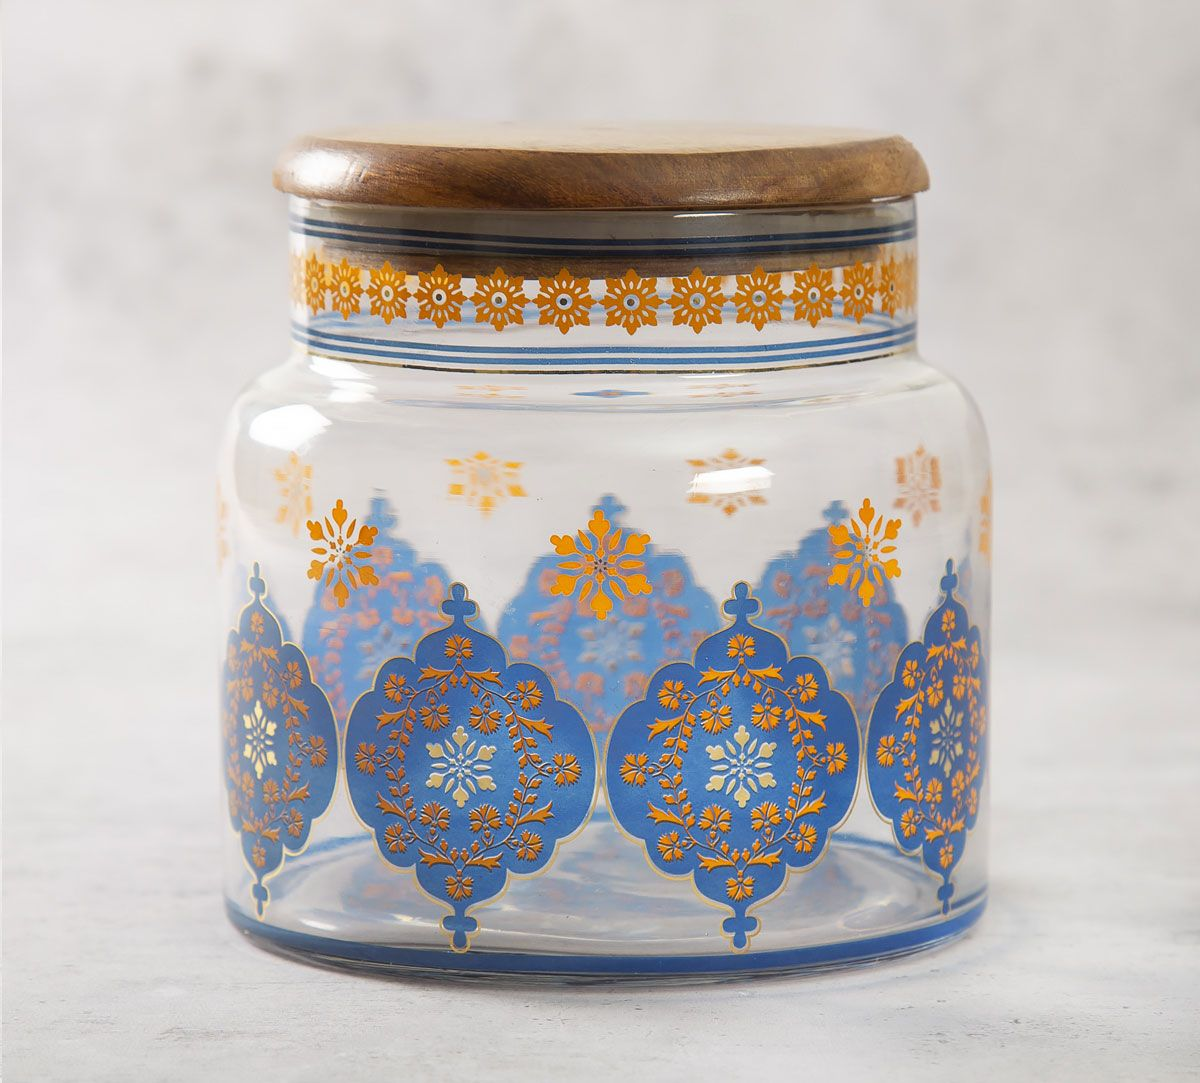 India Circus Floral Hypnosis Glass Jar